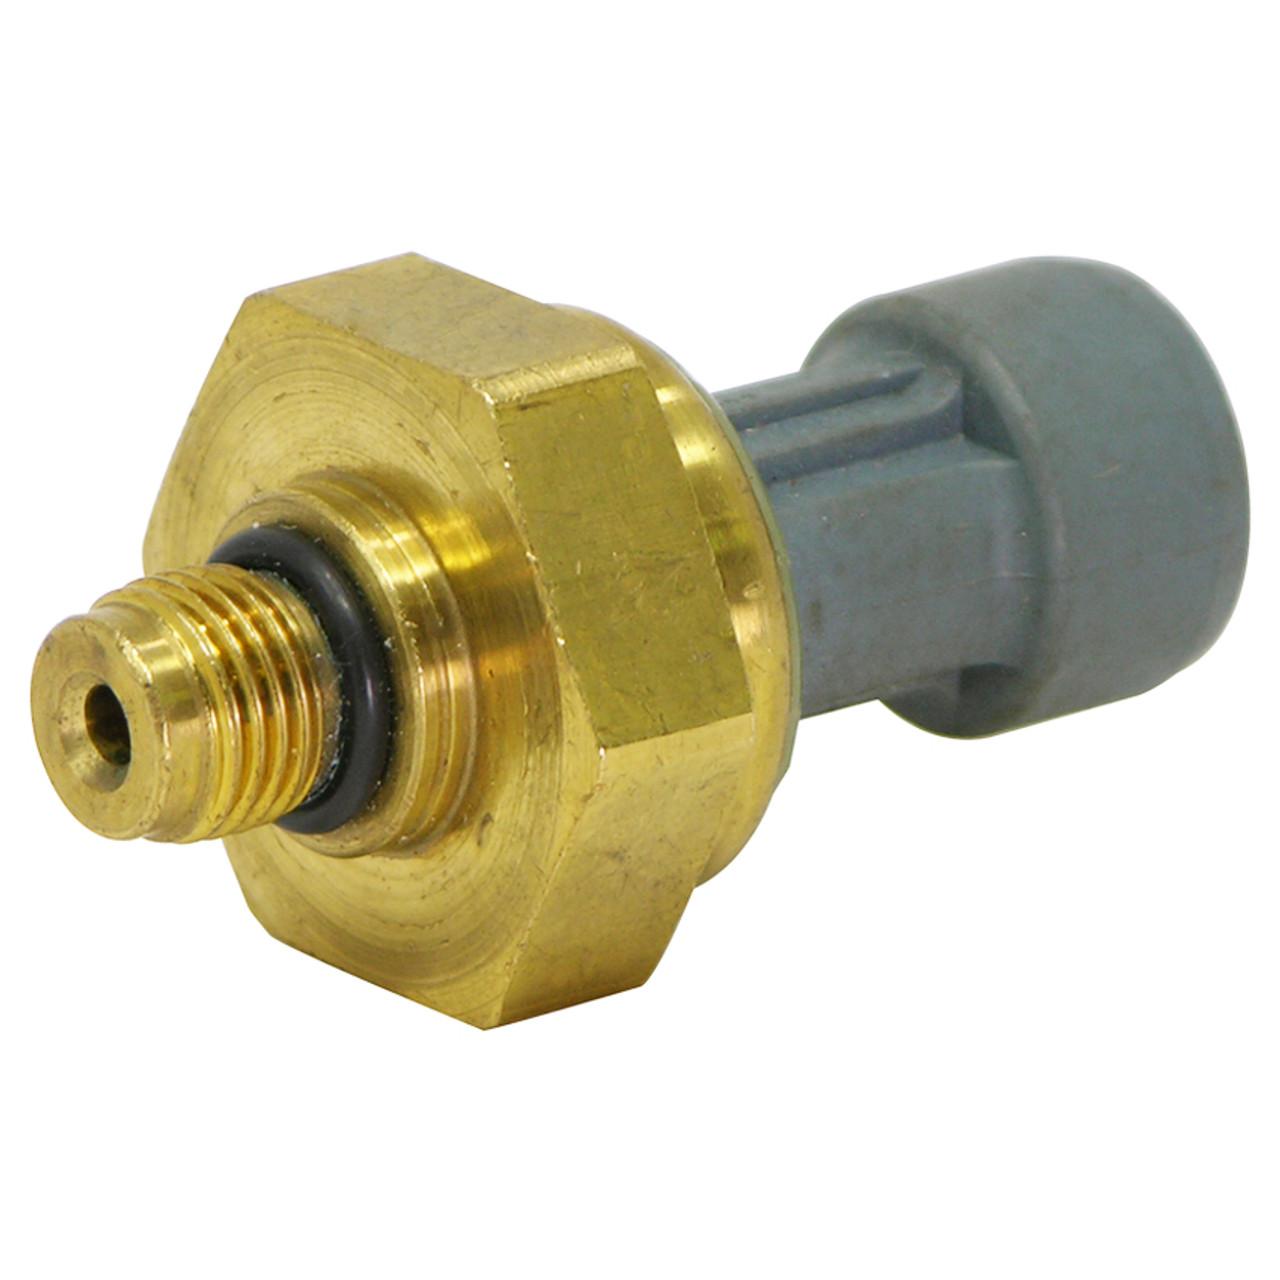 Ford 6 4L 2008-2010 Manifold Absolute Pressure - MAP Sensor | BTS021434